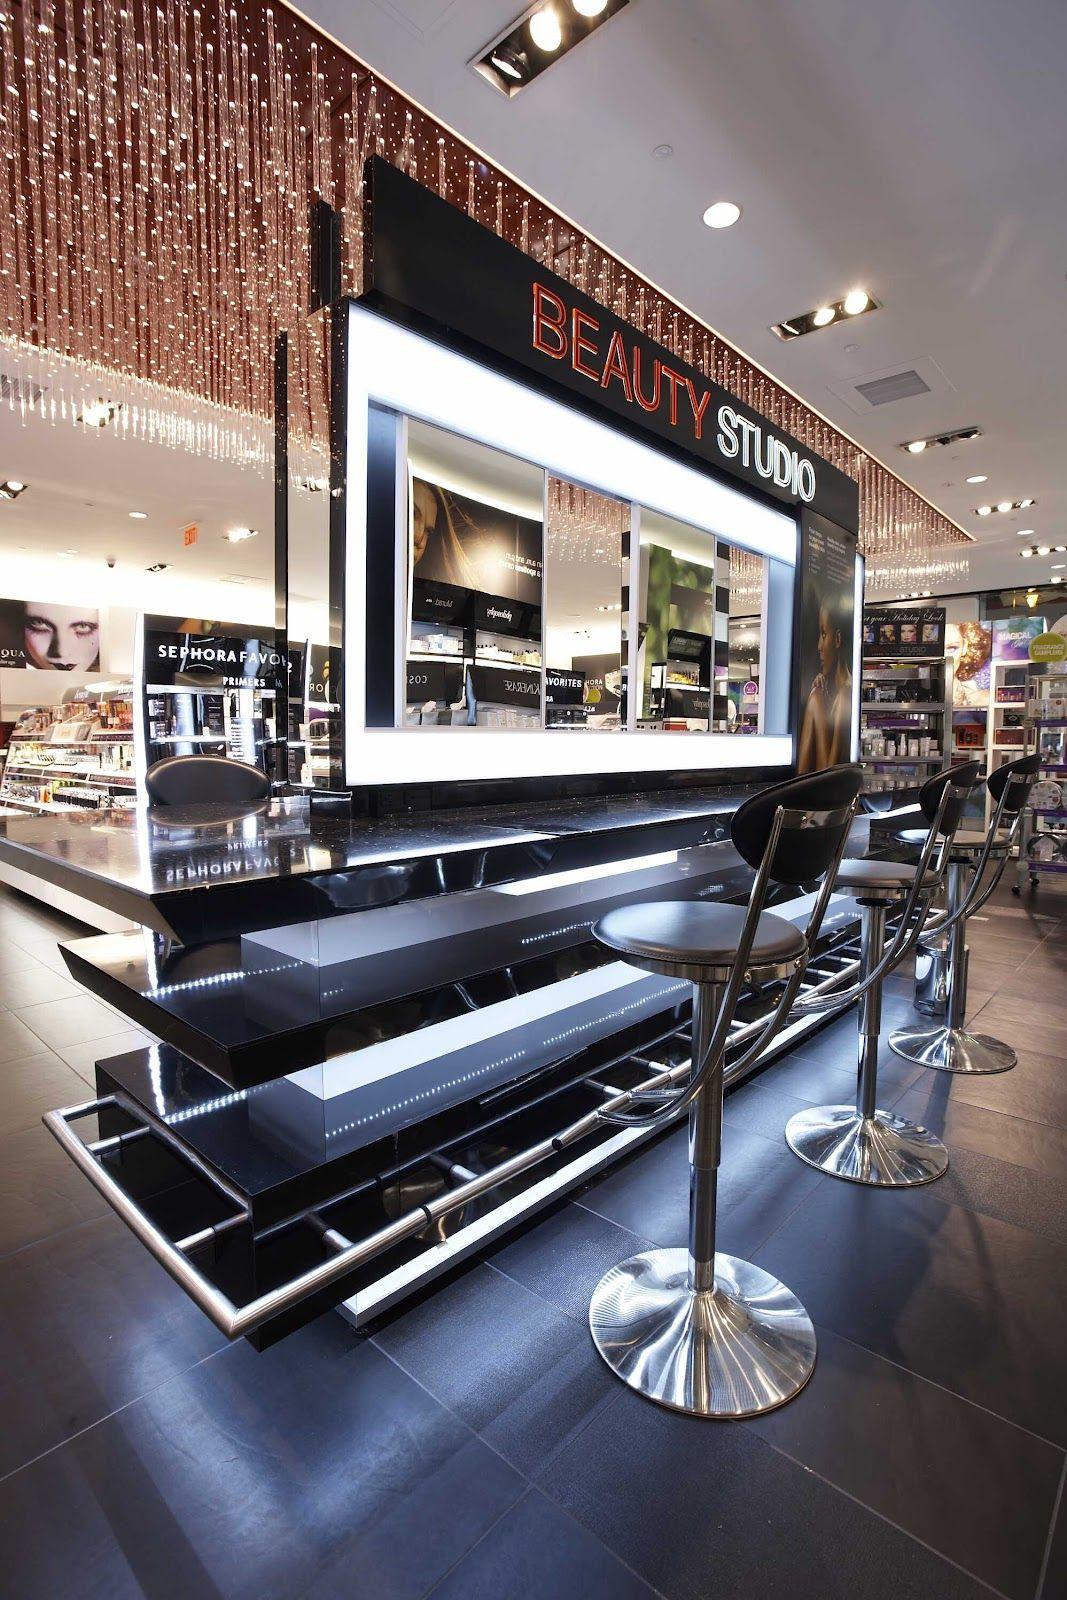 sephora store | Mall Hopper: Sephora opens in Malibu | sephora ...